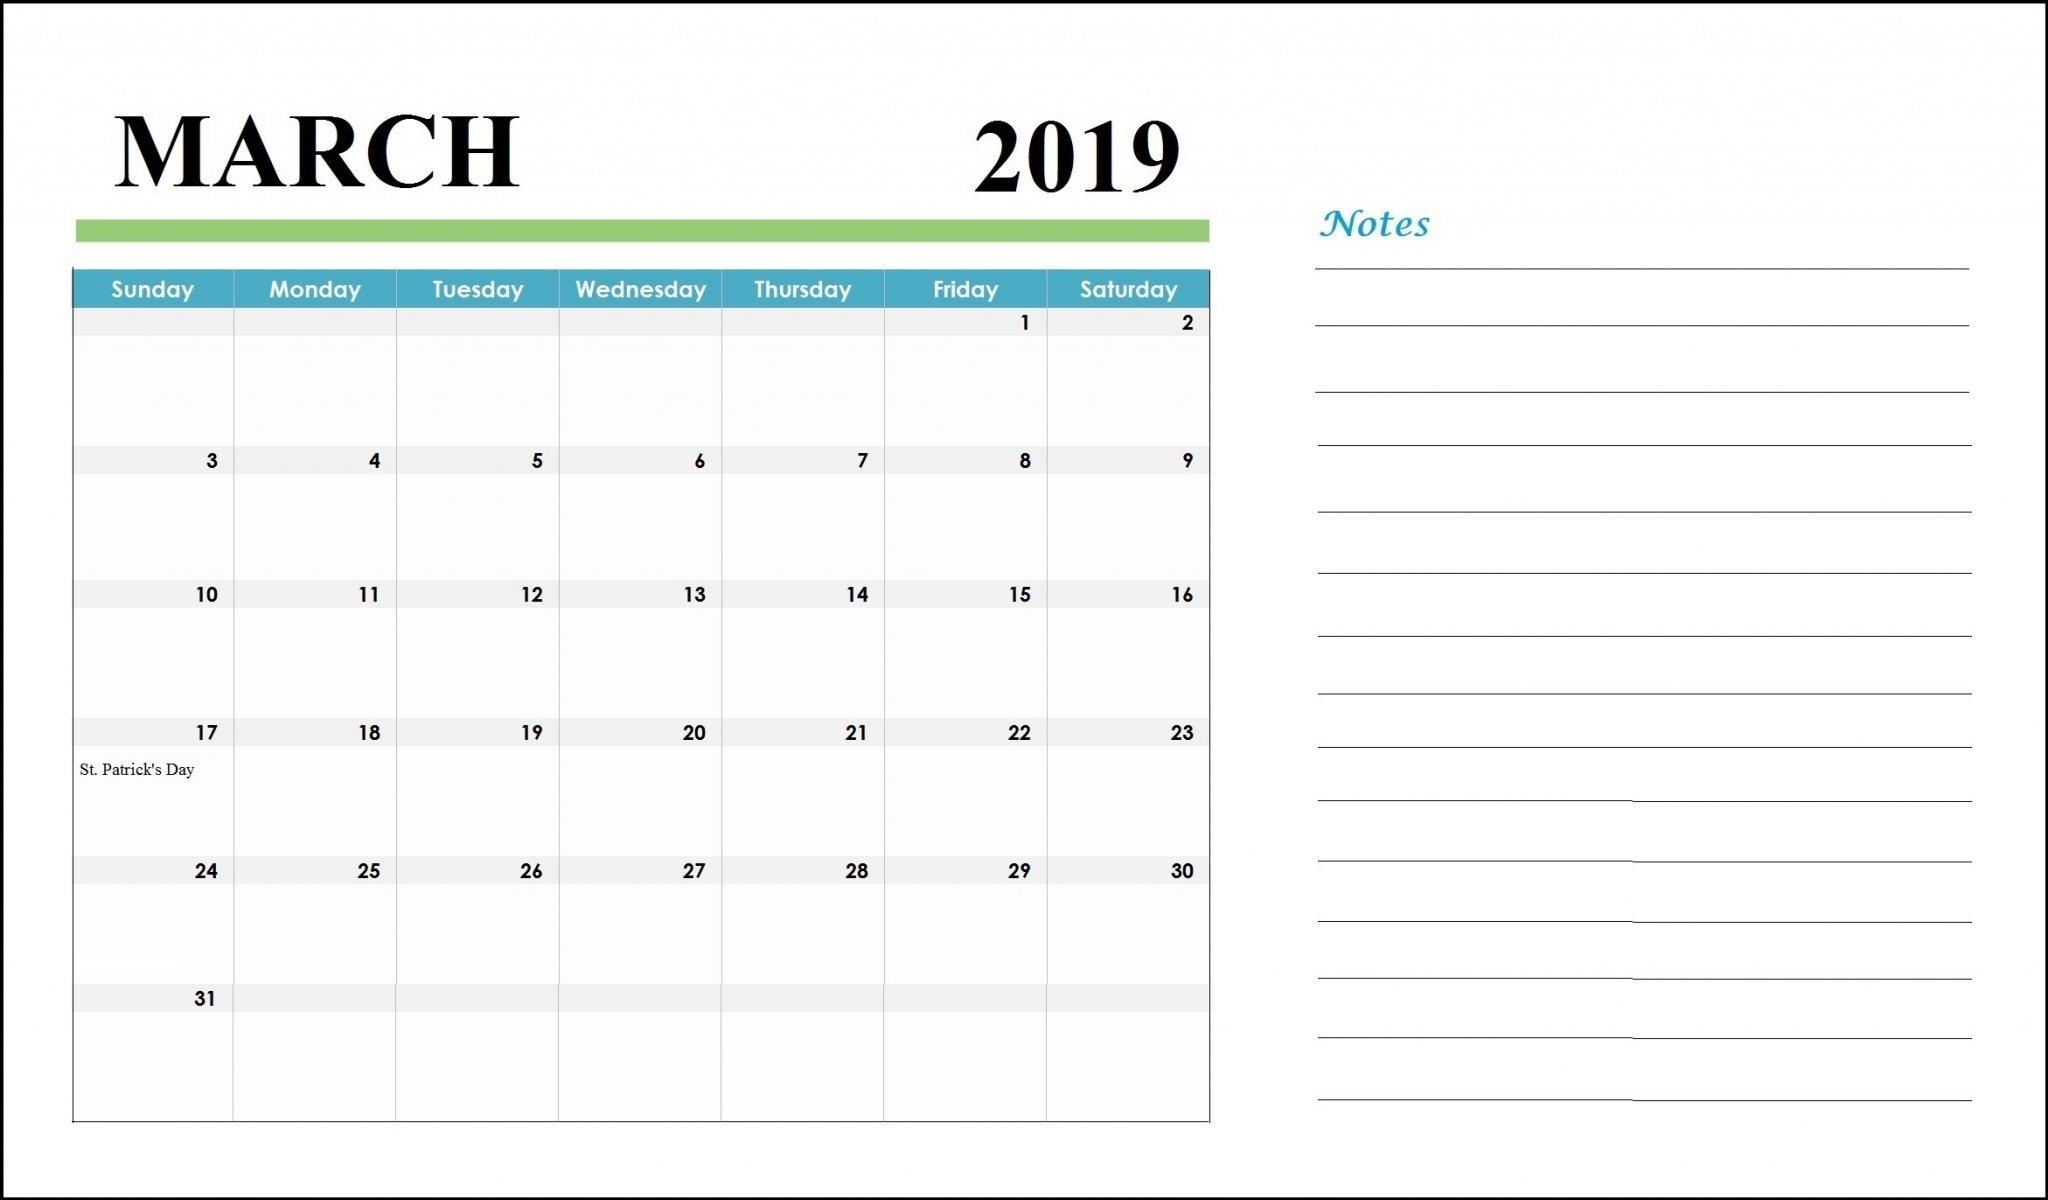 March 2019 Customized Calendar